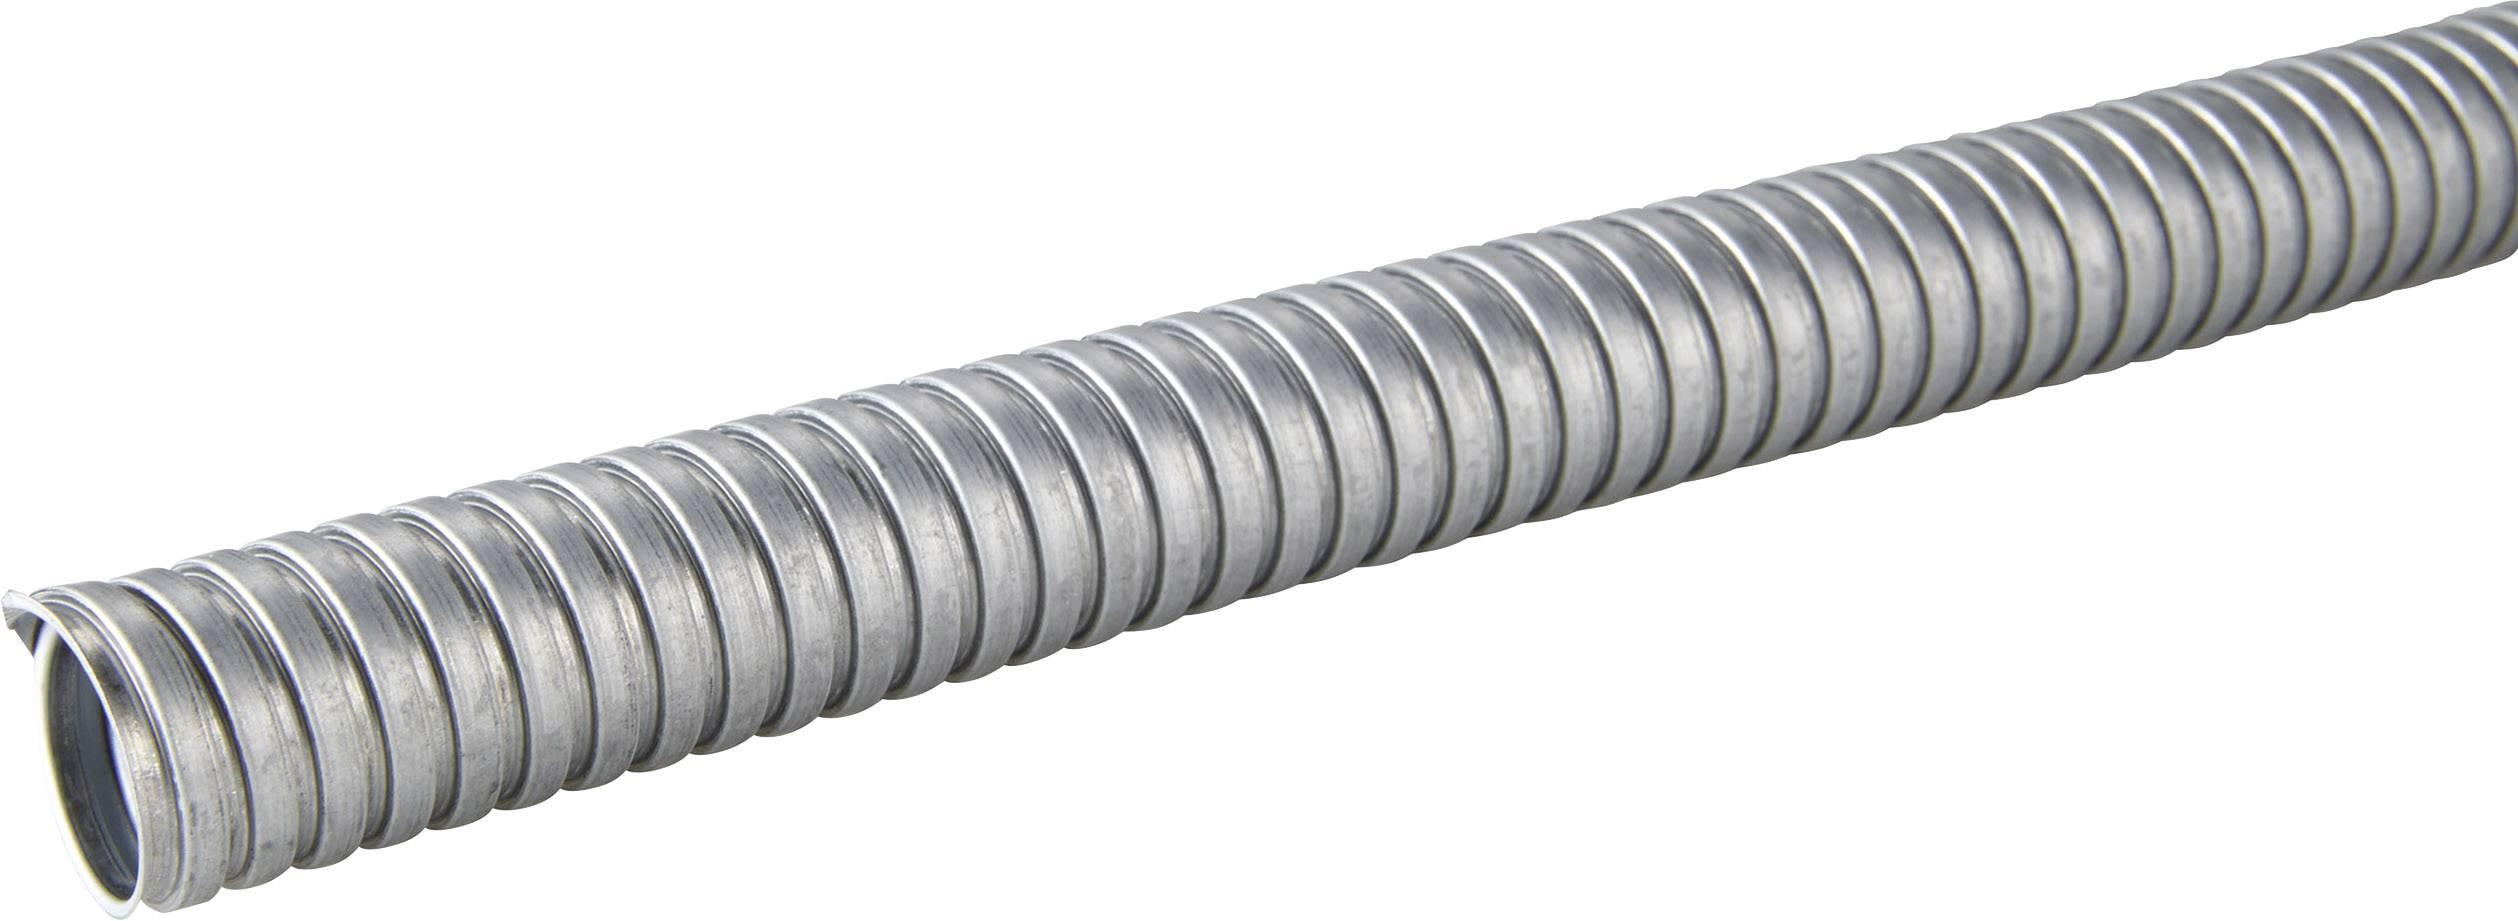 Ochranná hadice na kov LappKabel SILVYN® AS 9/11x14 61802090, stříbrná, 50 m